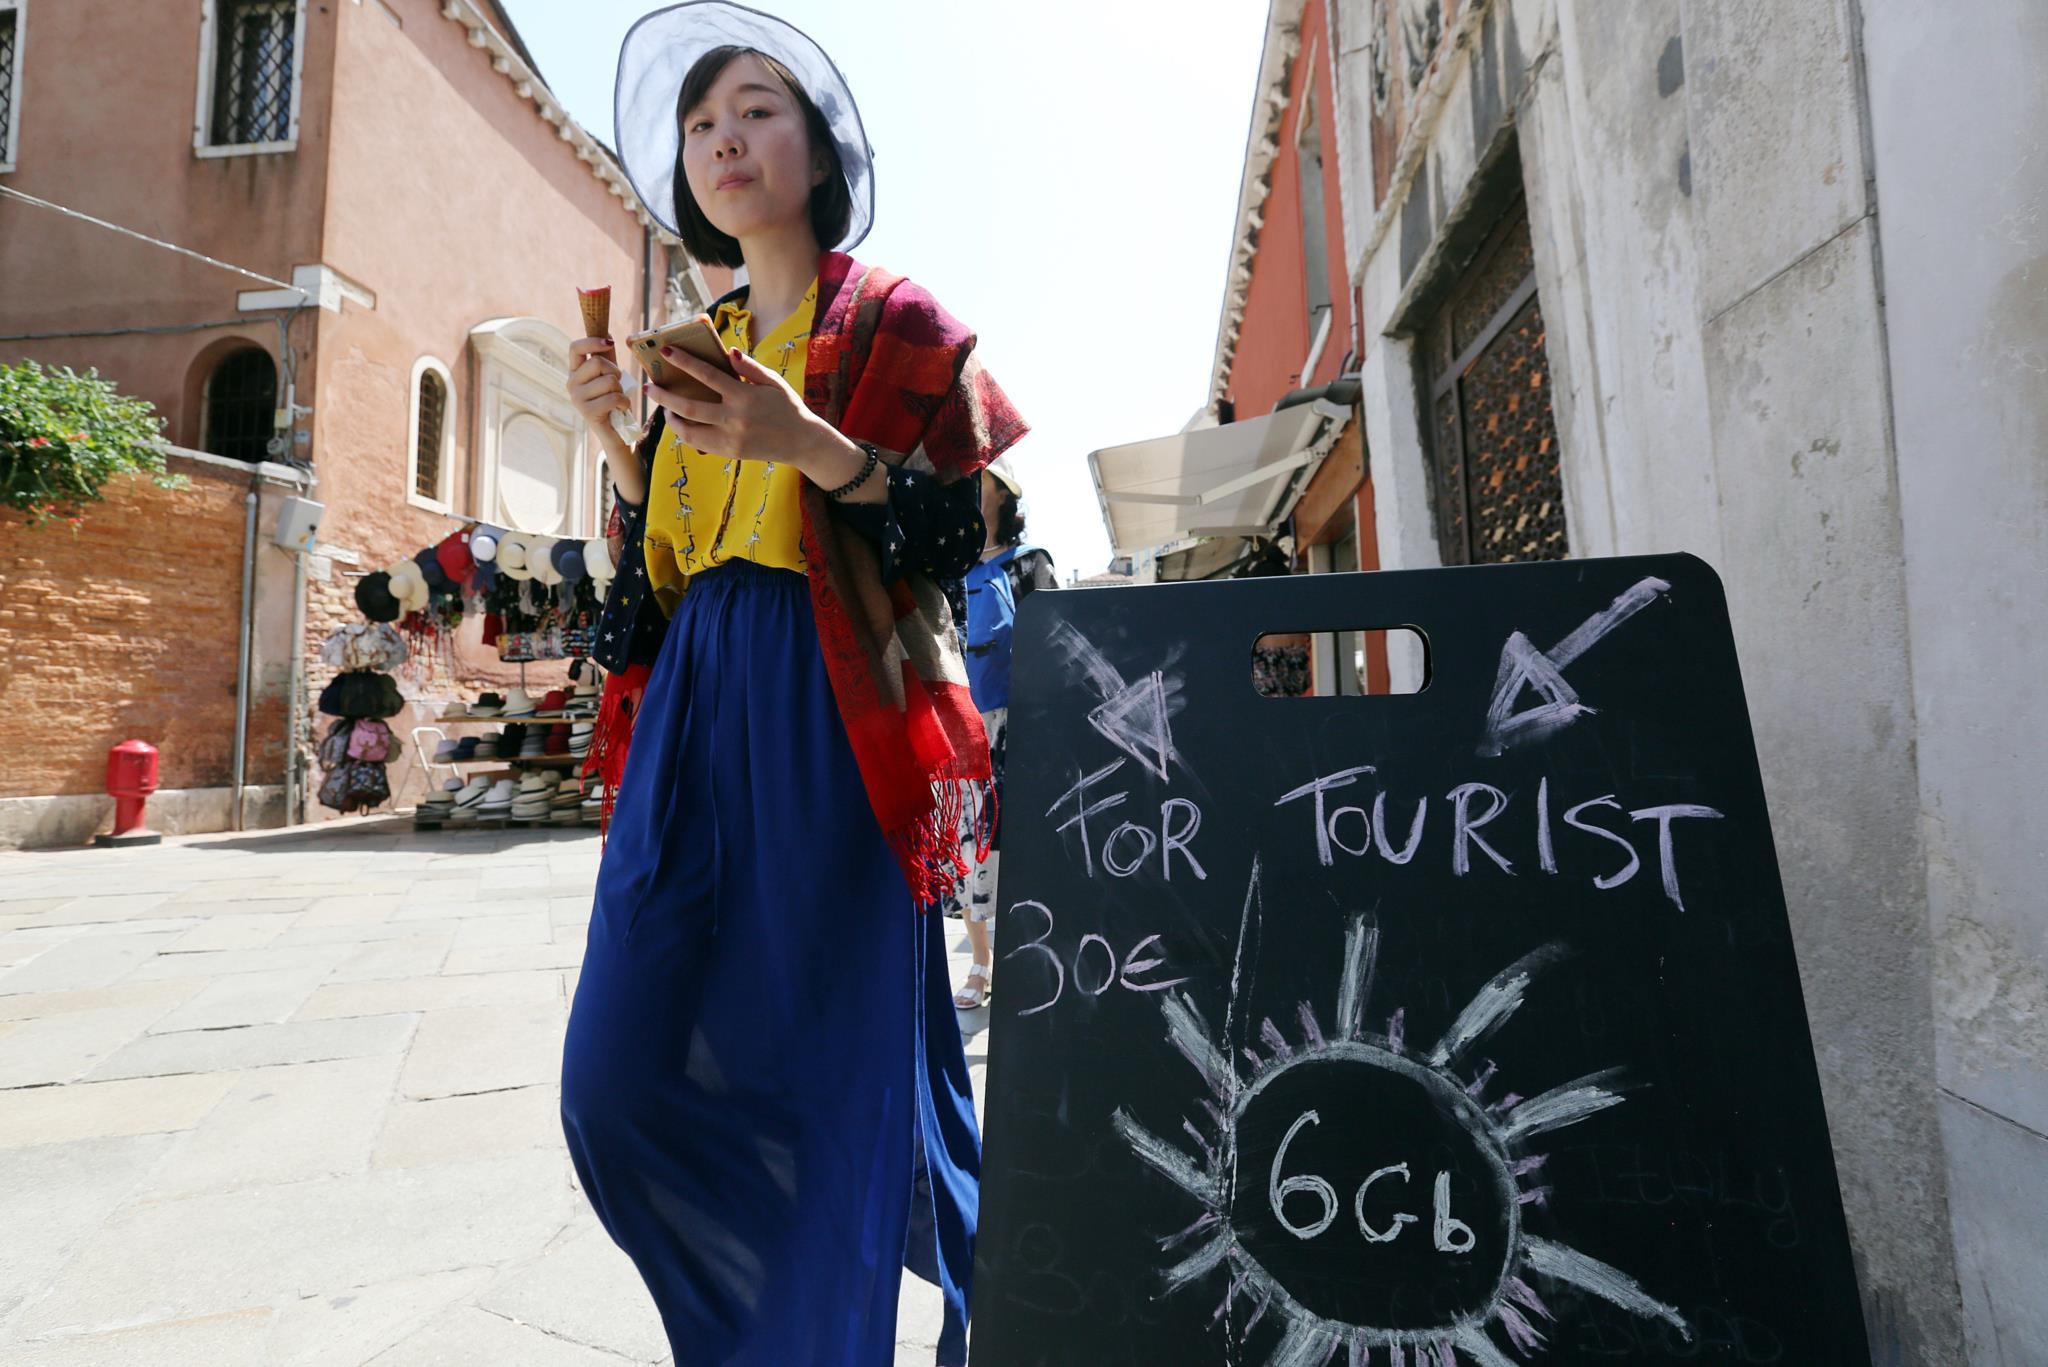 Oferta para turistas em Veneza